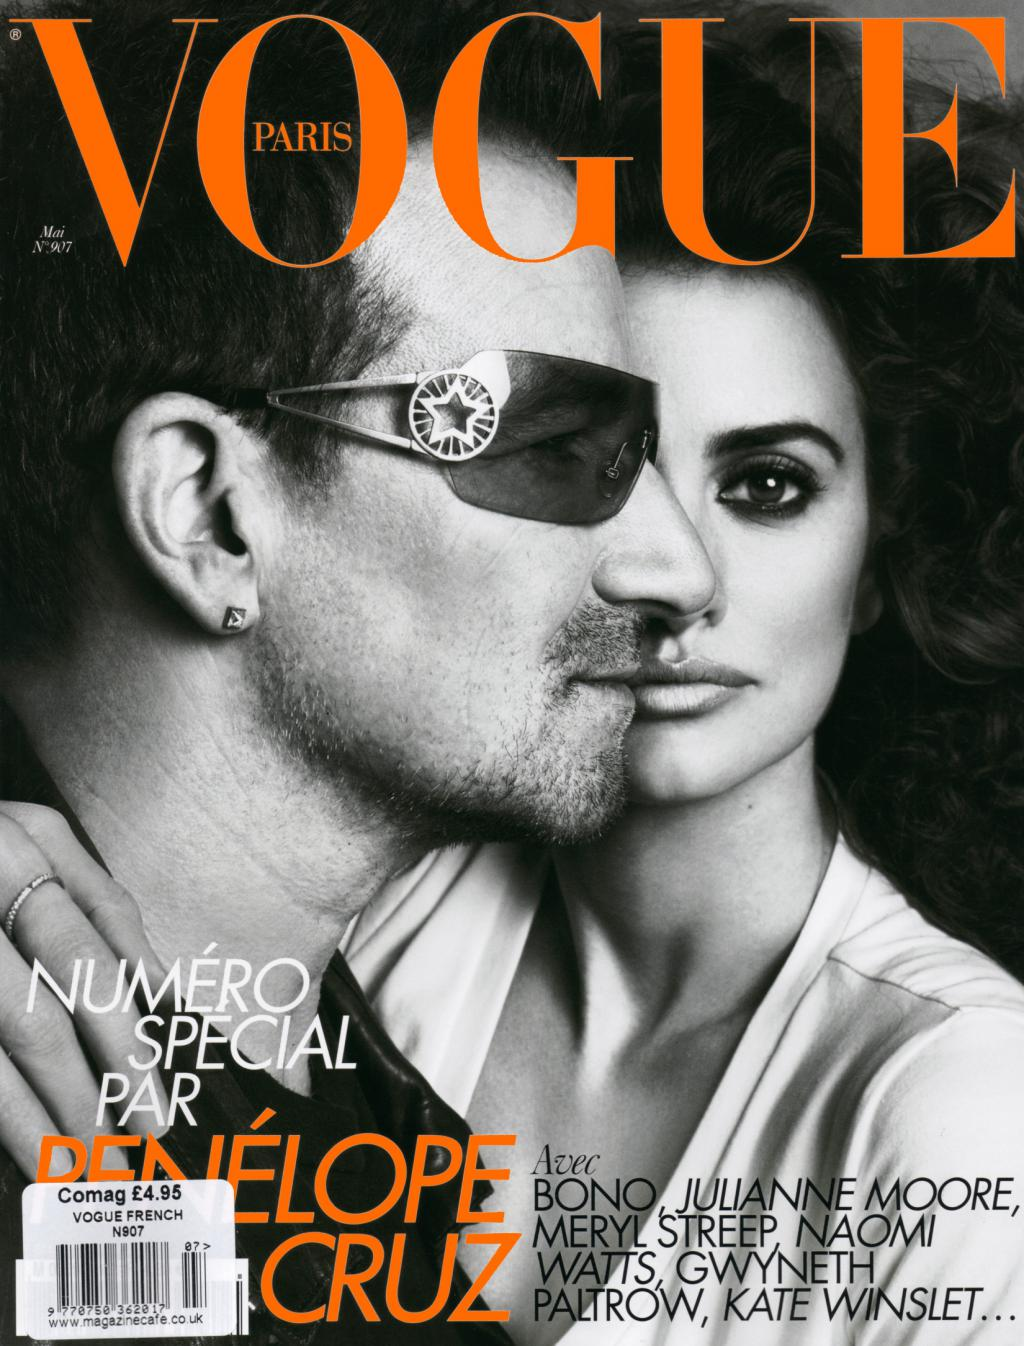 http://2.bp.blogspot.com/_eg2I5vDRaWM/S-FsjhR4eSI/AAAAAAAALC8/m7NHf6F1dsc/s1600/Vogue+Paris+-+Penelope+Cruz+%26+Bono+by+Inez+%26+Vinoodh.jpg